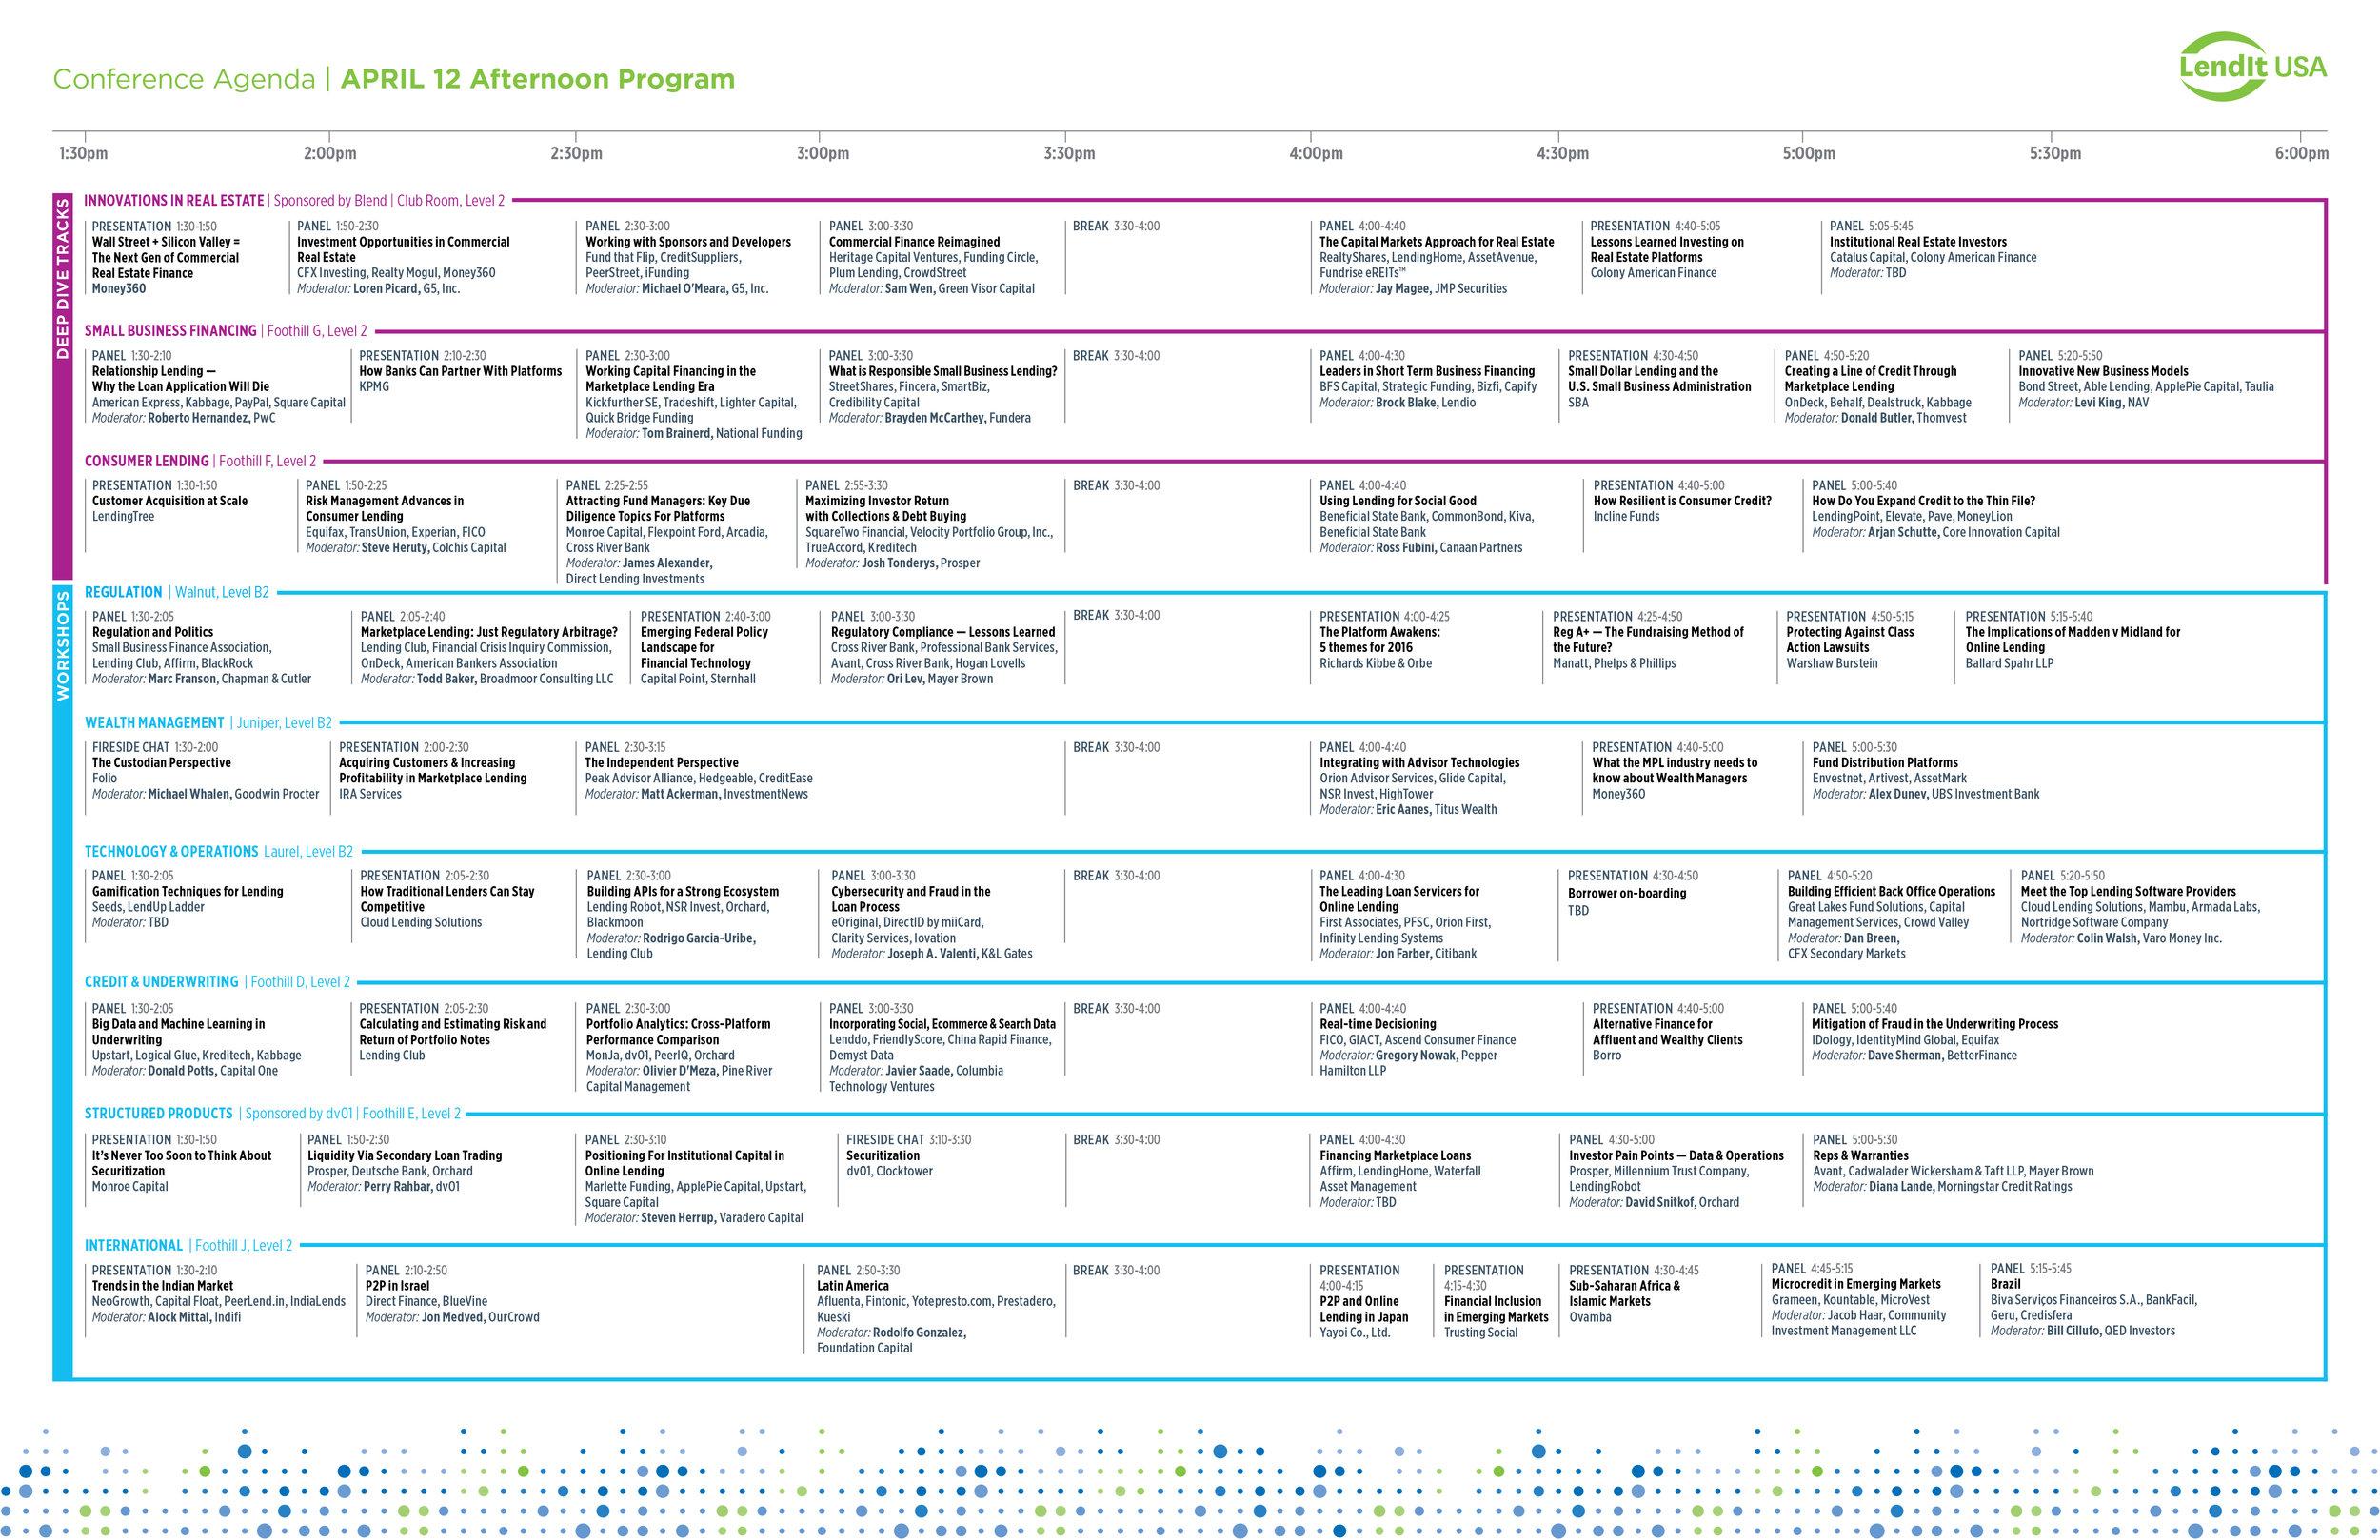 Agenda Informational Guide